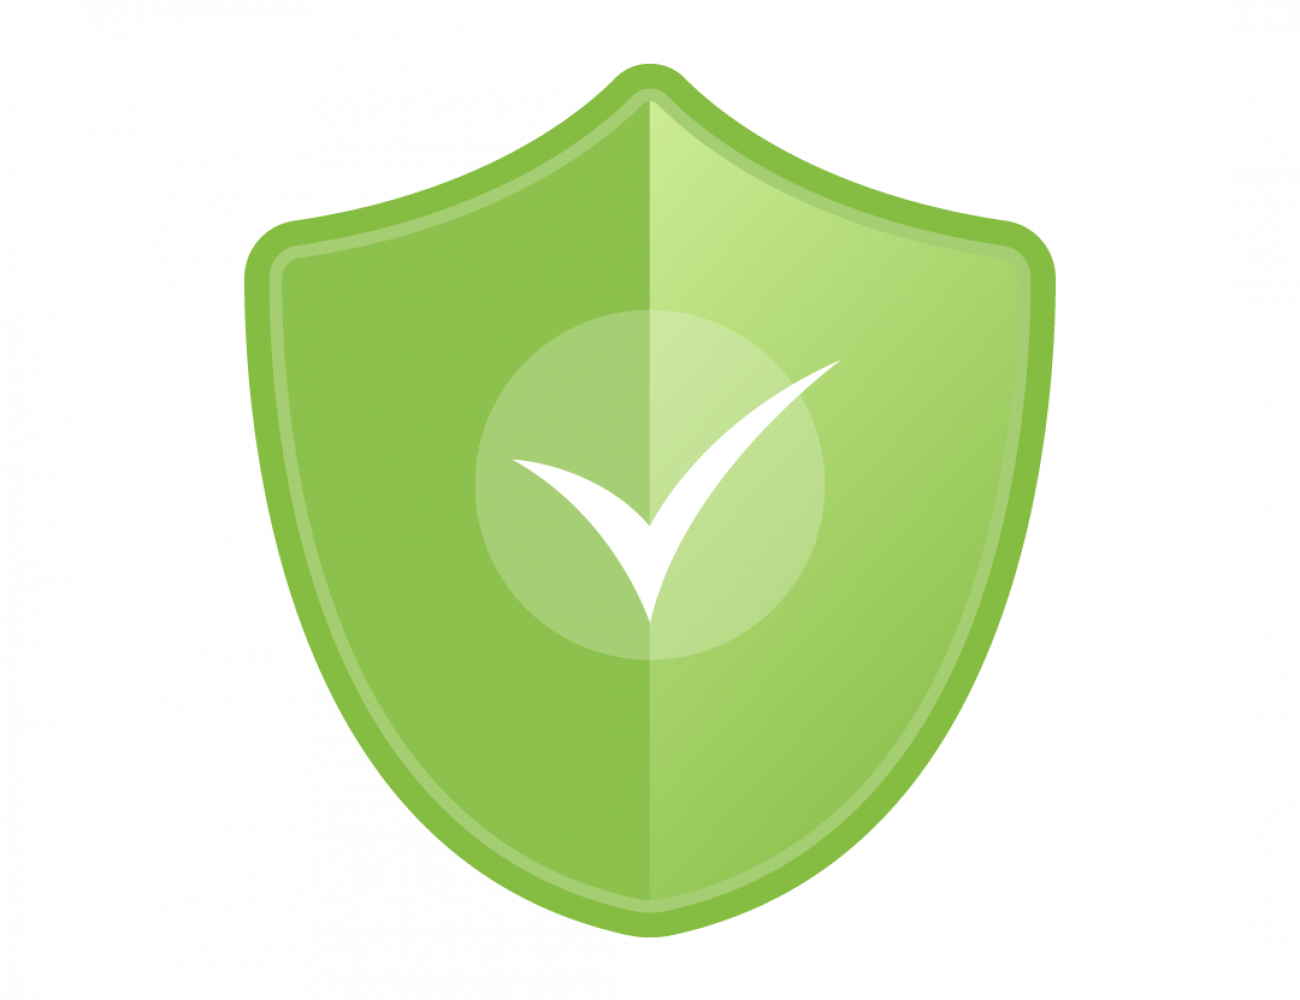 TritoTech Cyber Security